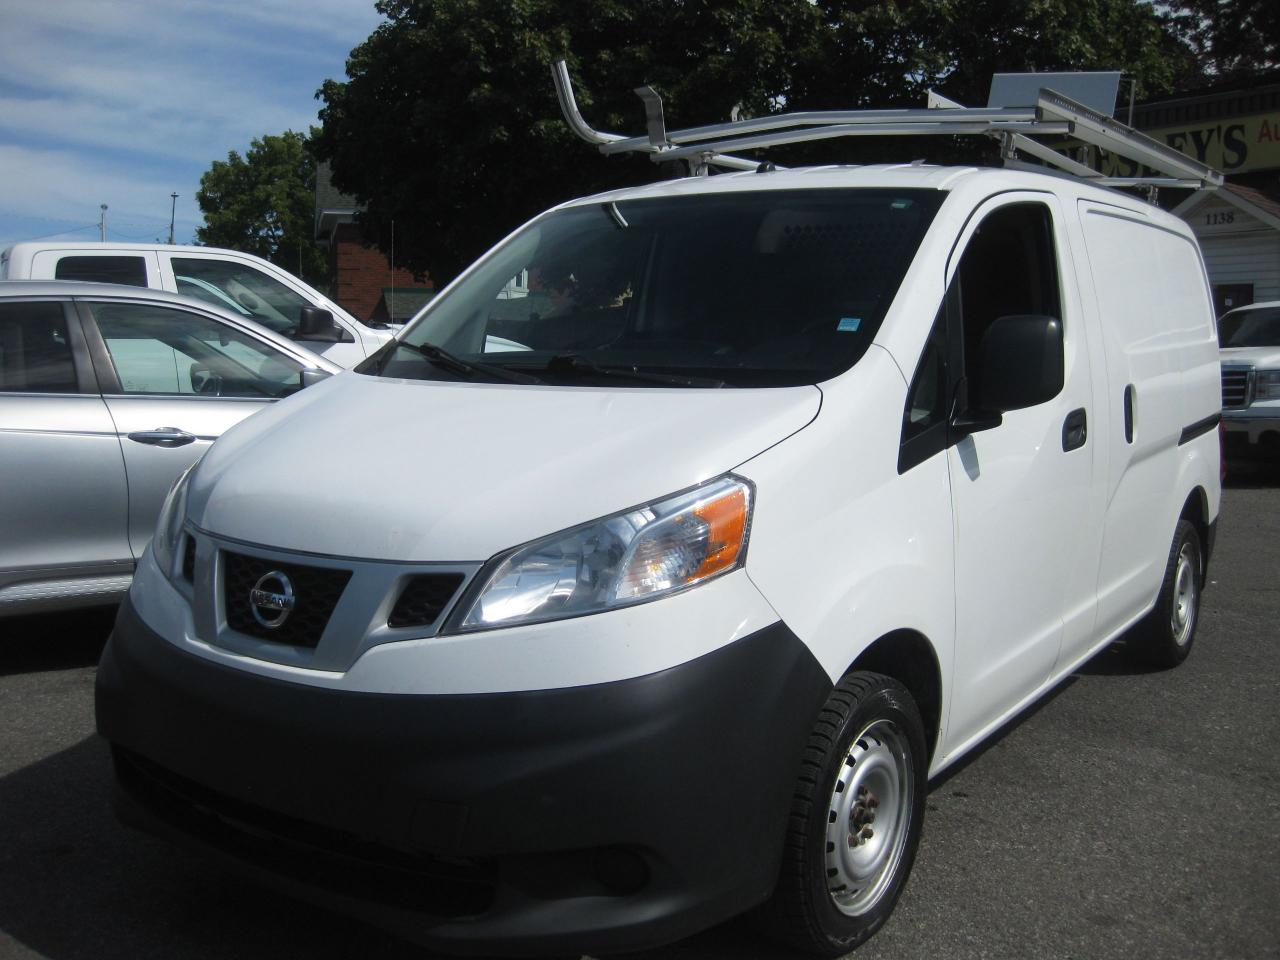 2014 Nissan NV200 S 2.0L 4cyl. 2pass Auto AC Cruise